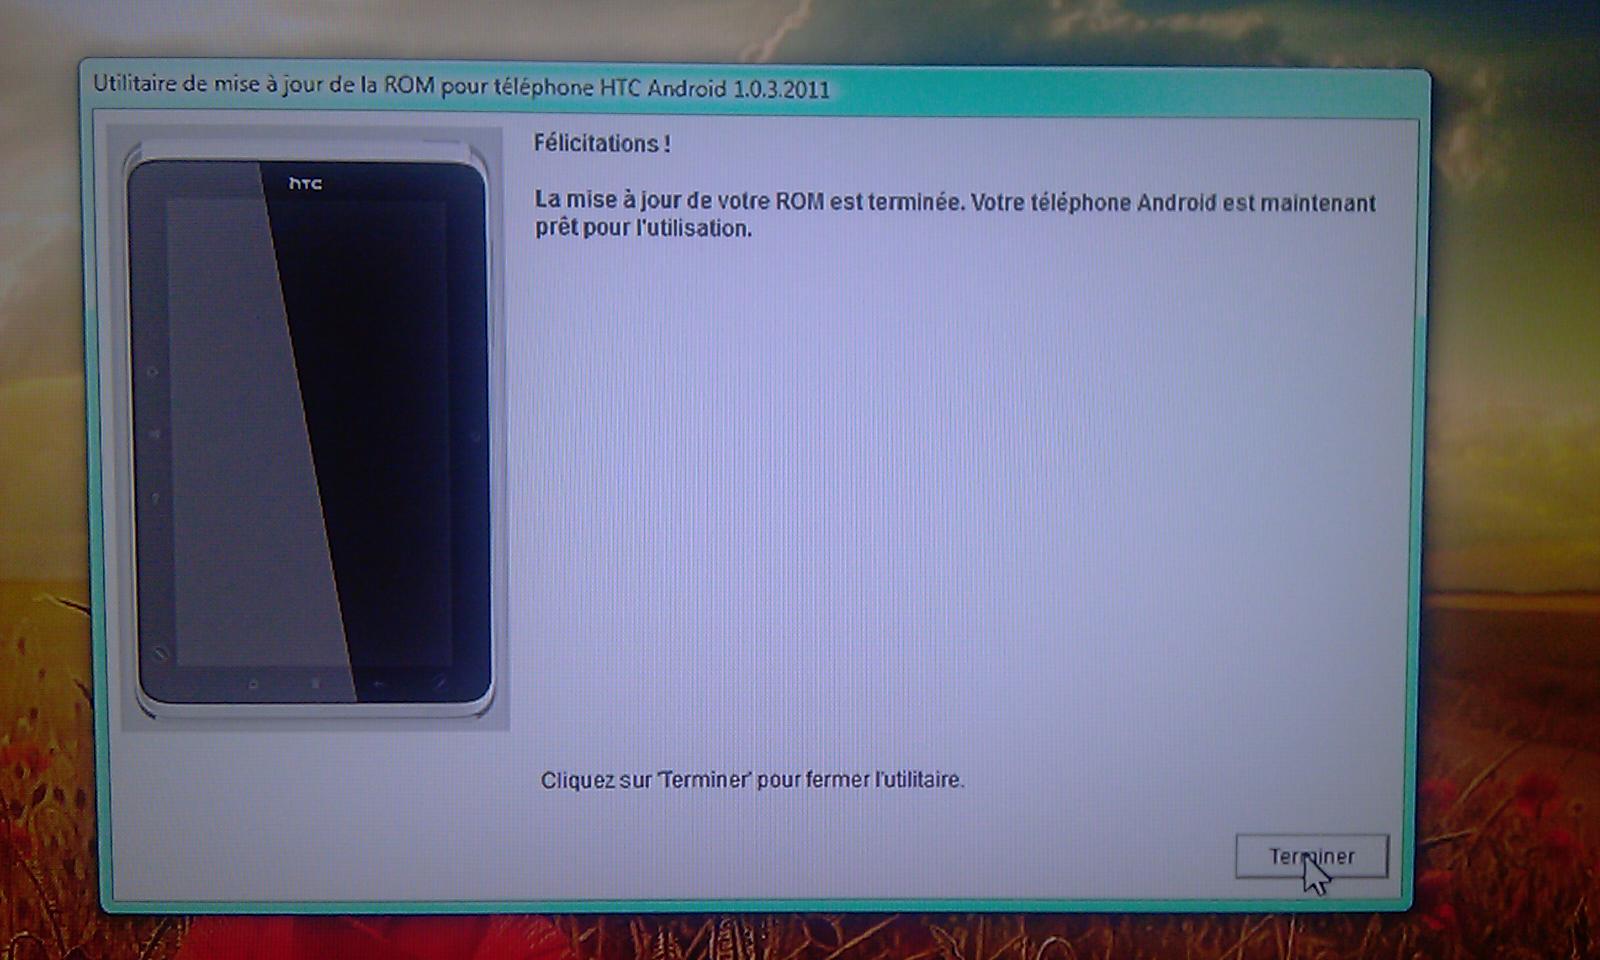 [Tuto] Downgrade vers GB, passage en S.Off, installation Leedroid GB 2.2.0 (en images) 493486DowngradeHC8